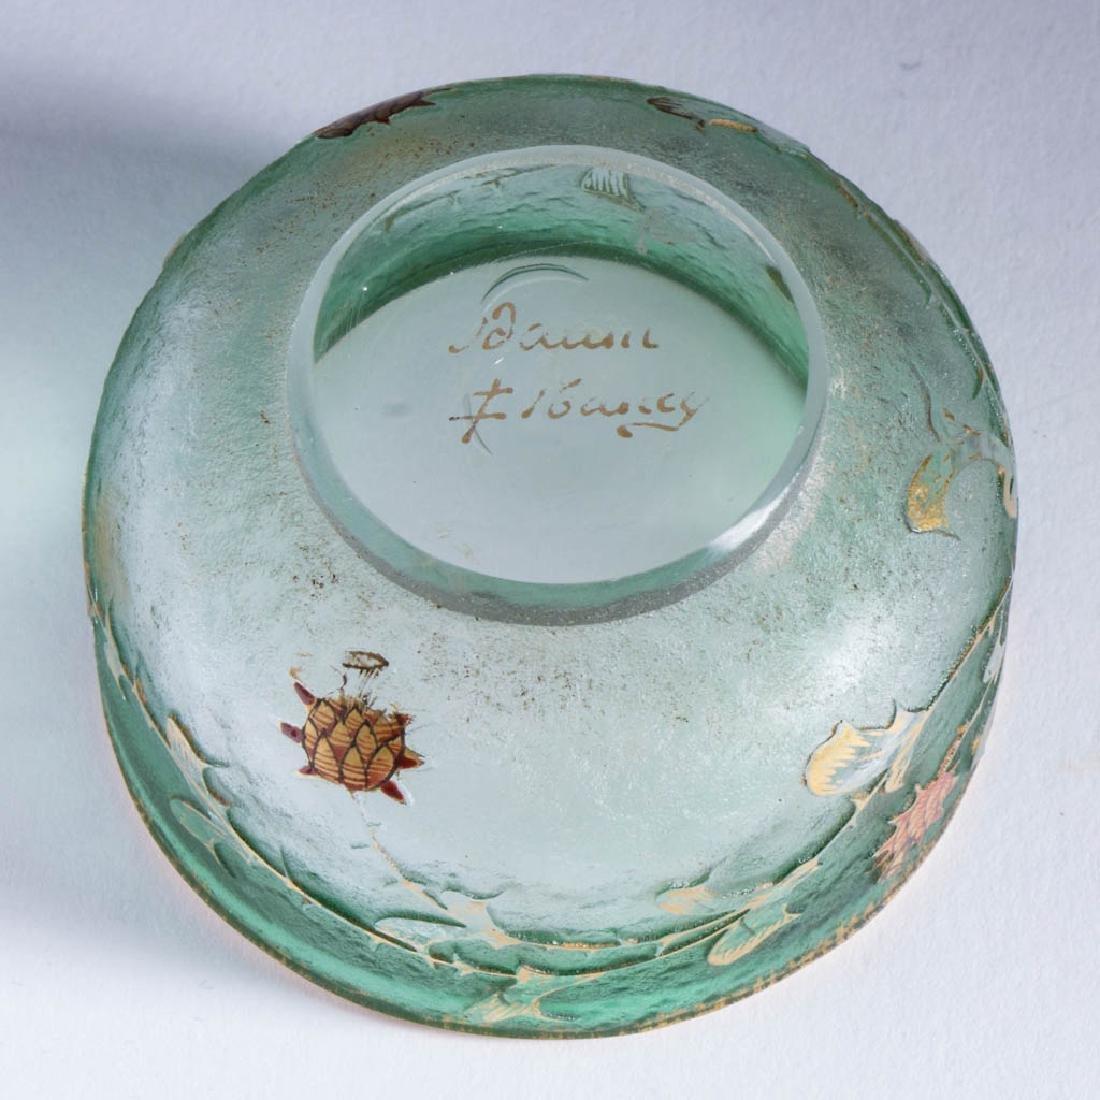 DAUM NANCY FRENCH FOLIATE CAMEO ART GLASS OPEN SALT - 4